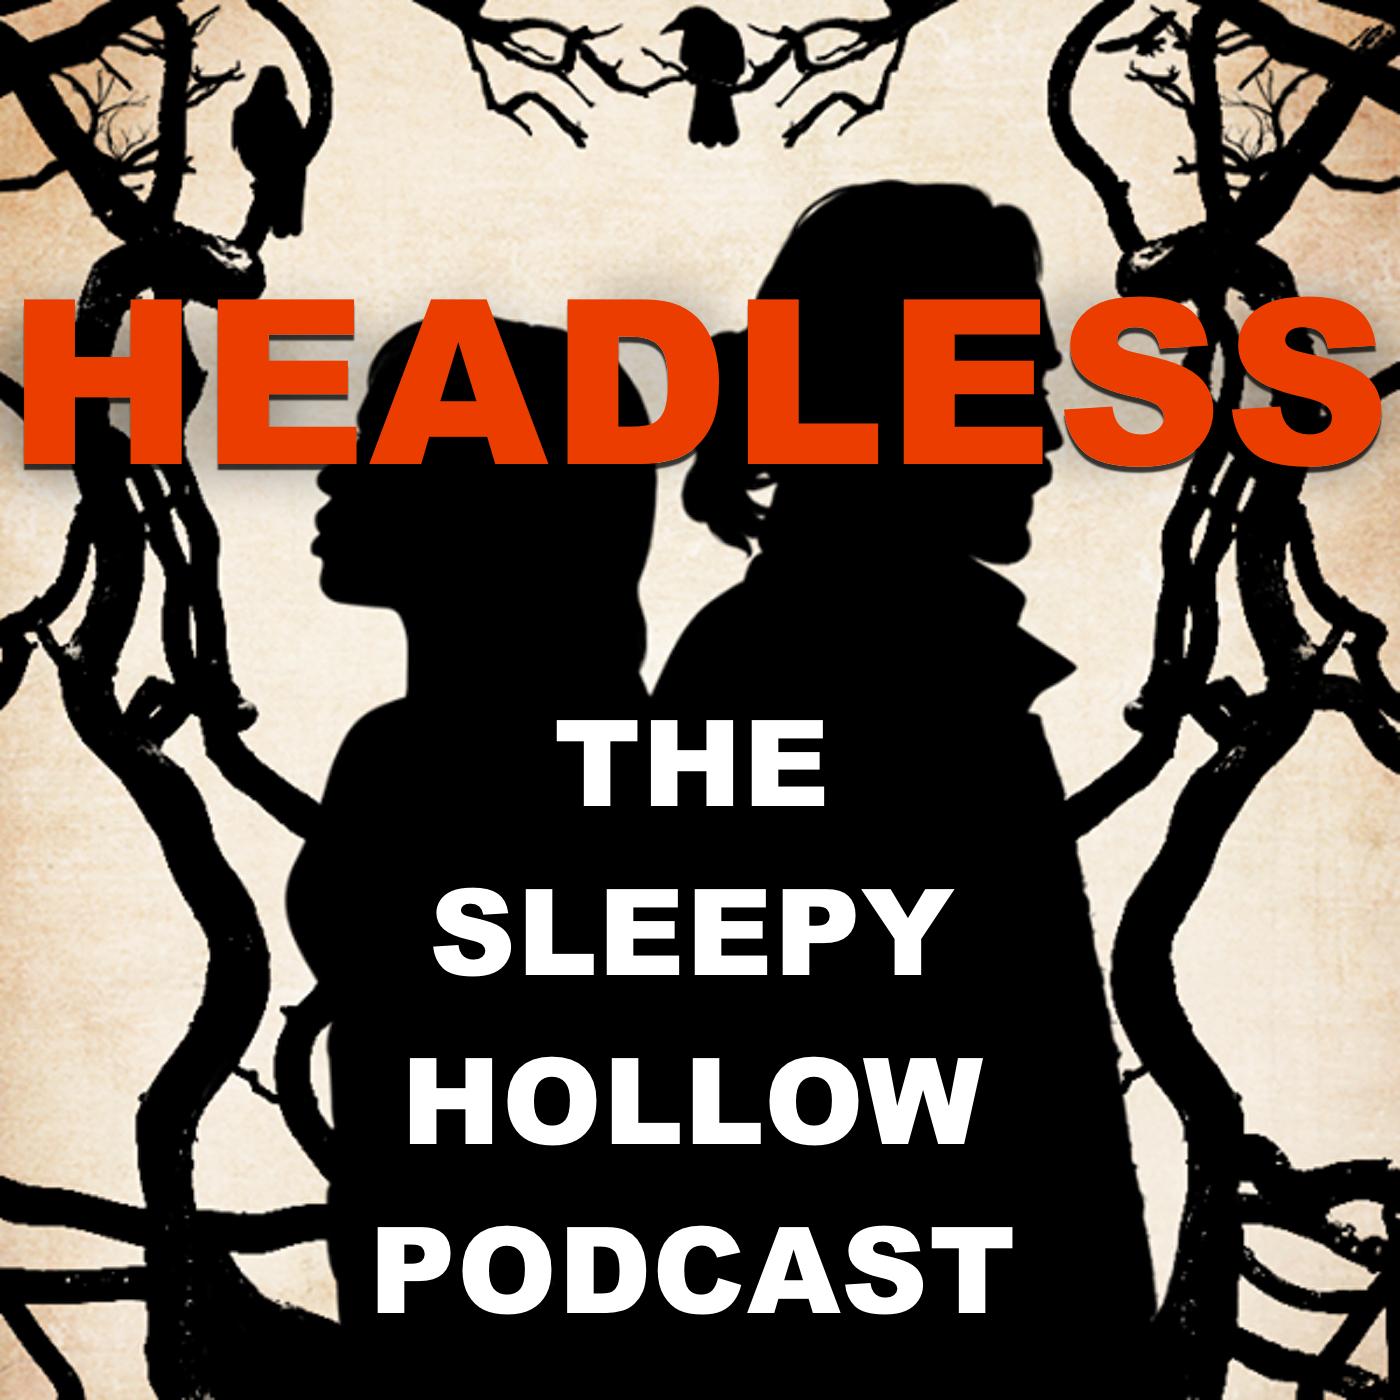 Headless: The Sleepy Hollow Podcast logo